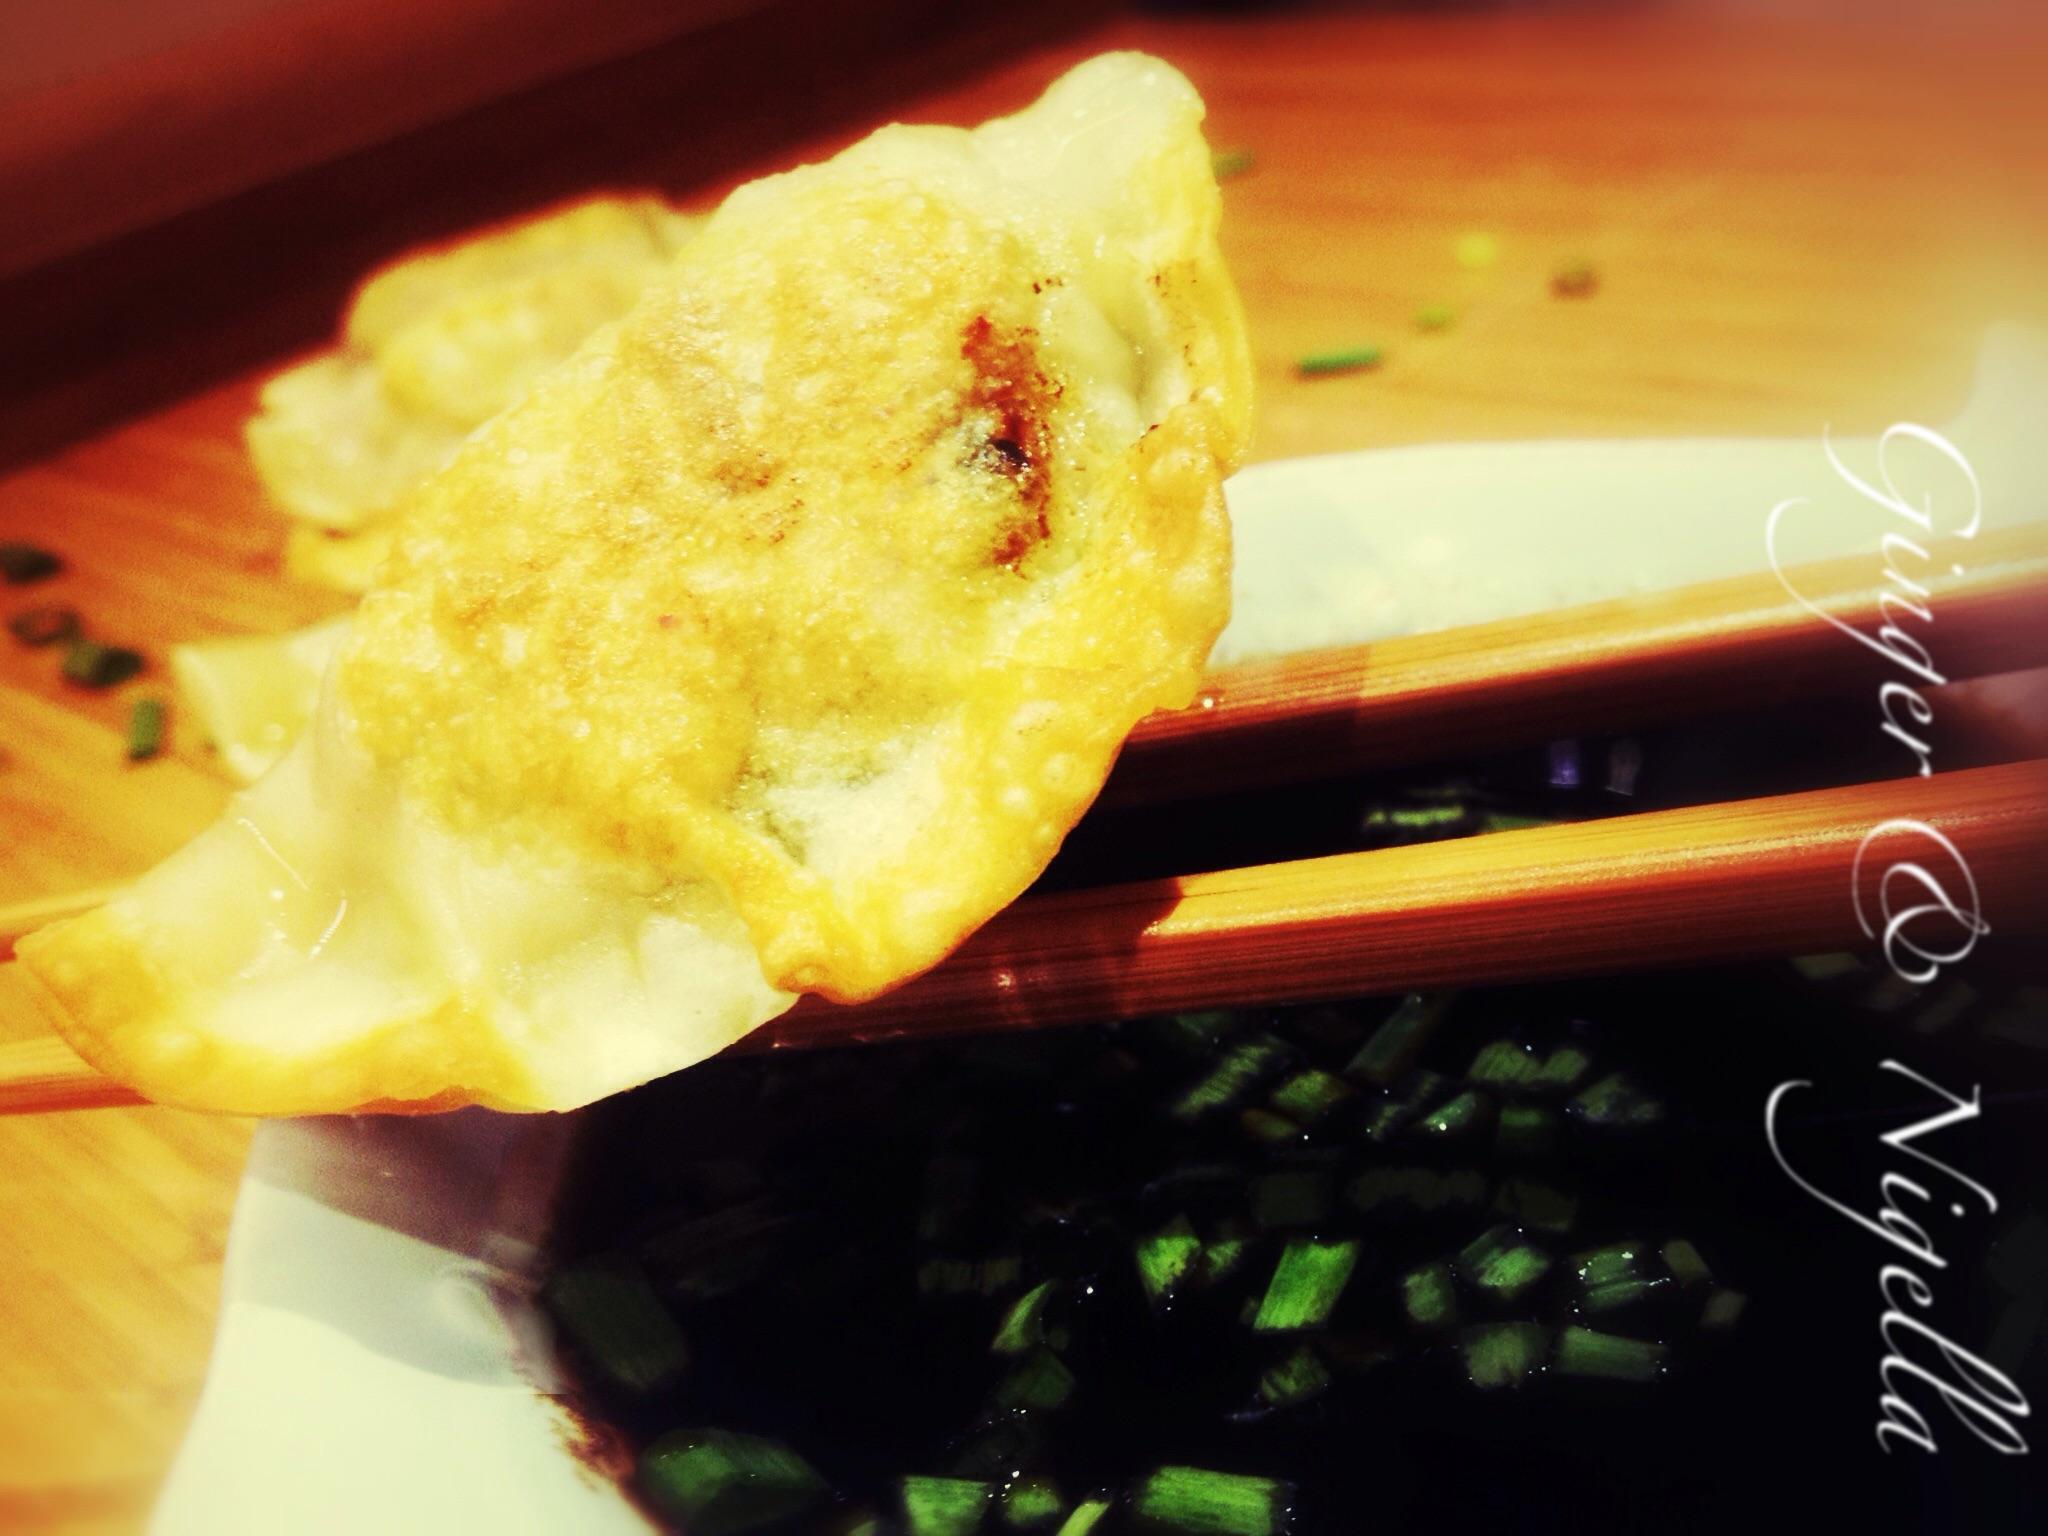 Gyoza, ravioli giapponesi, soia, cucina Giapponese, cucina dal mondo, wrap, shitake